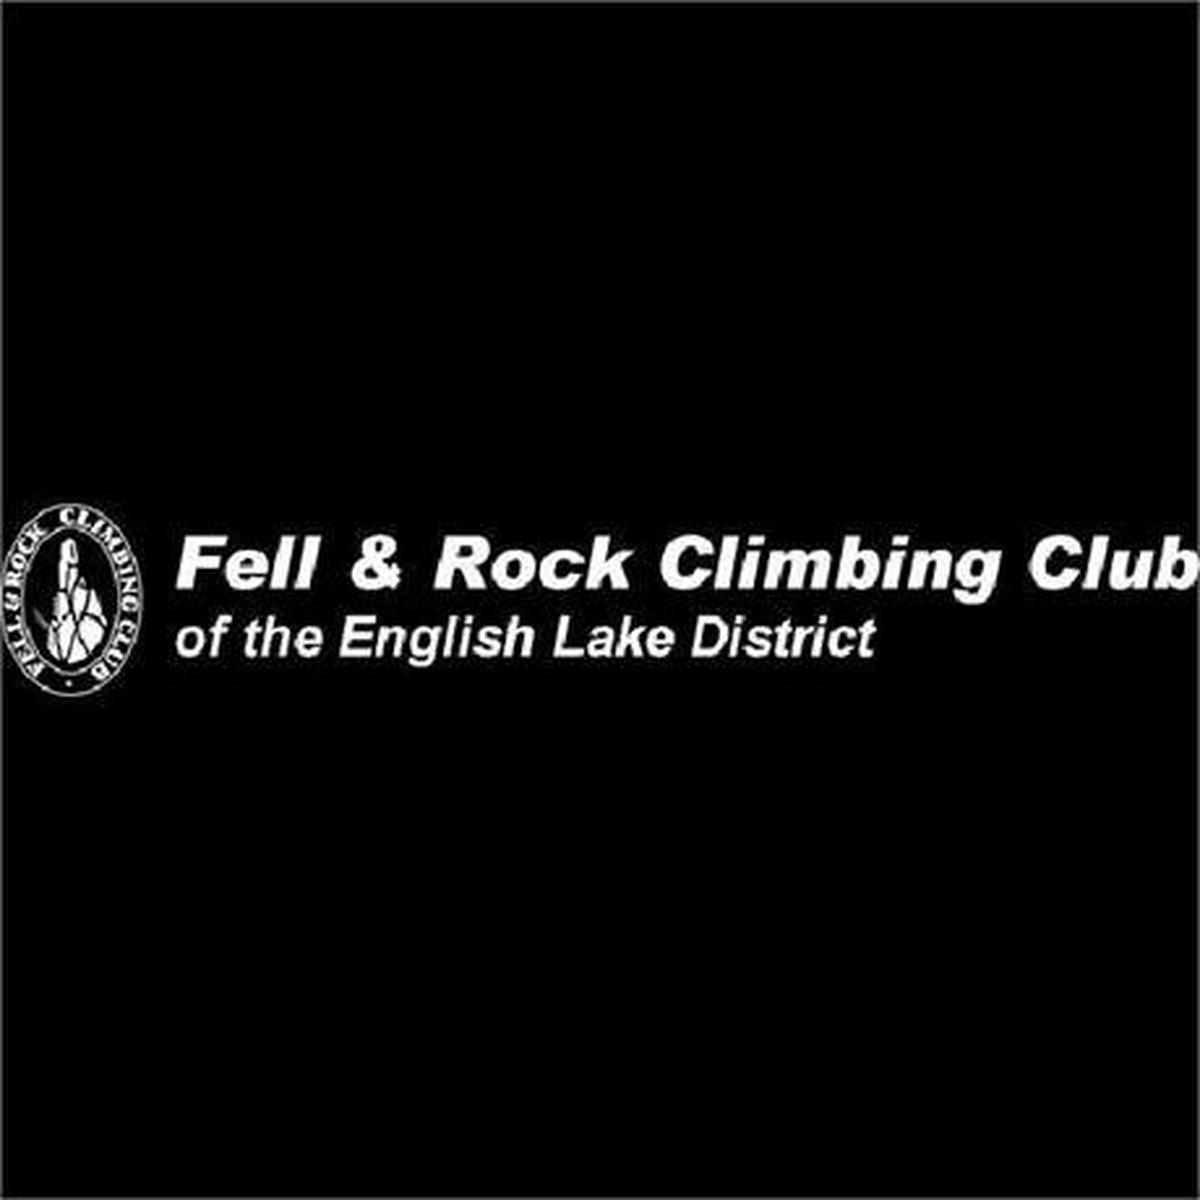 Frcc Guide Books FRCC Climbing Guide Book: Gable & Pillar